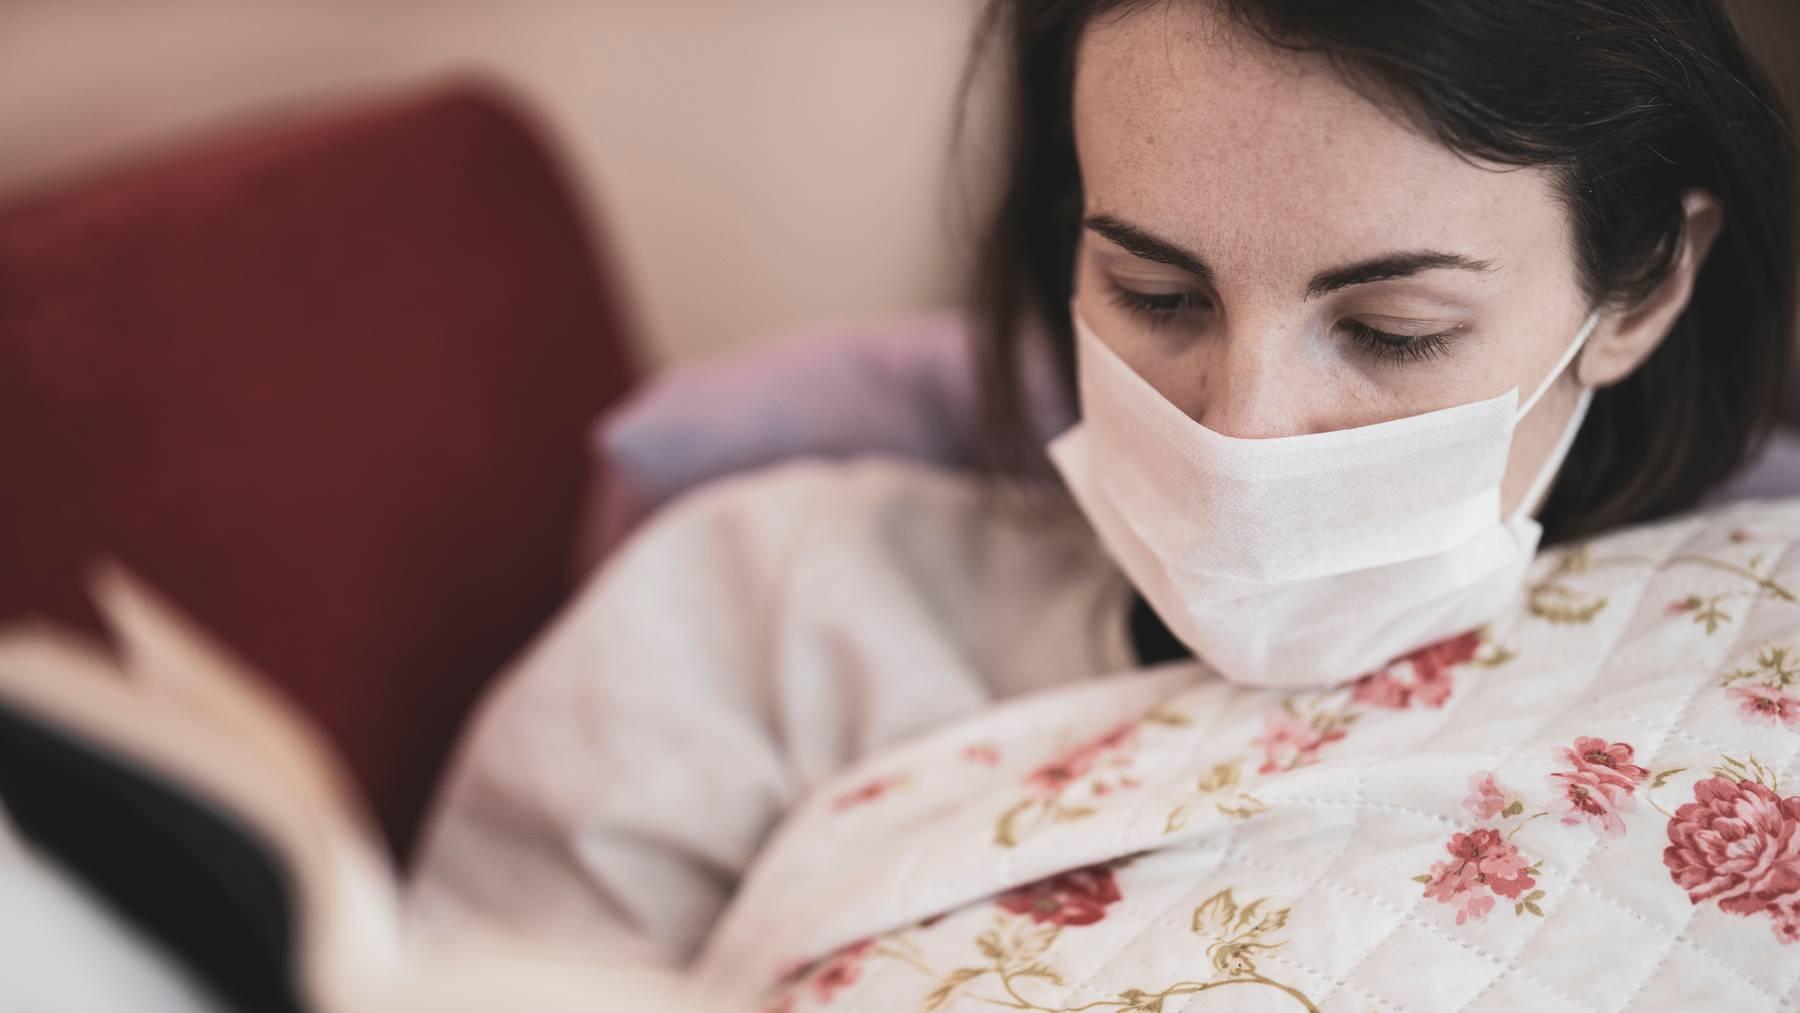 Maske Grippe